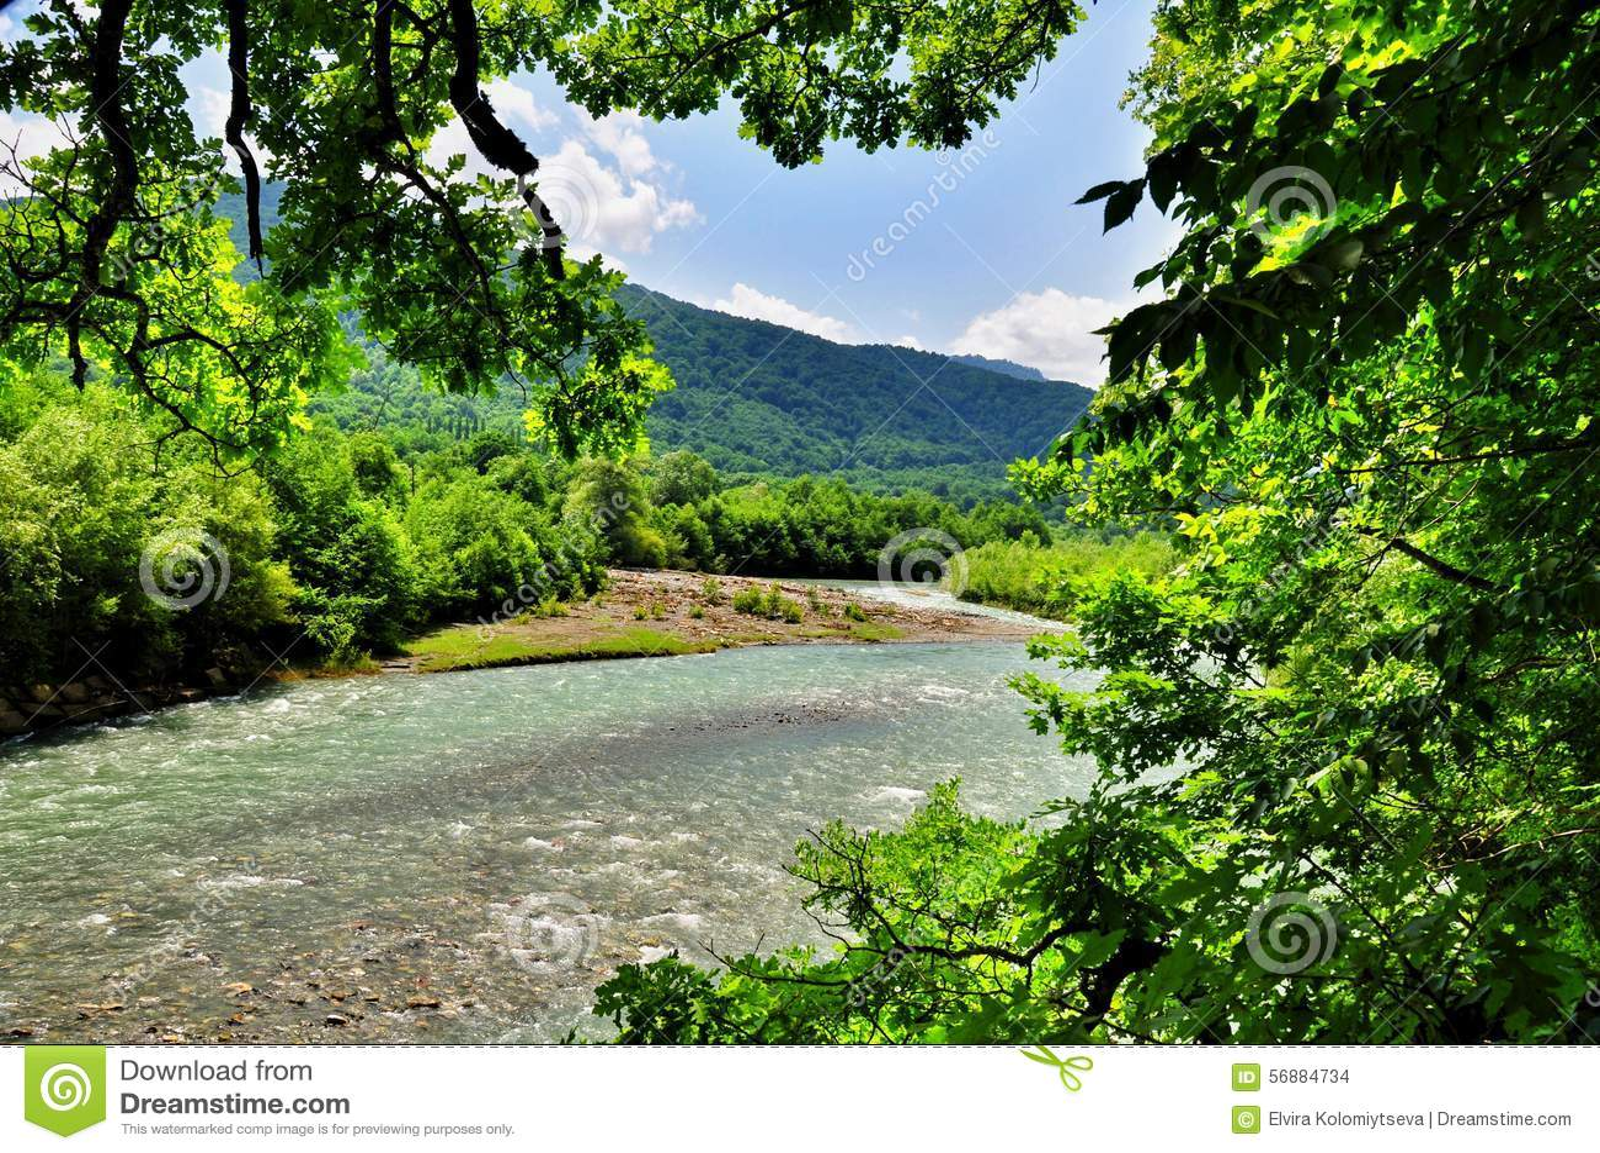 Landschap van snelle rivier Malaya Laba